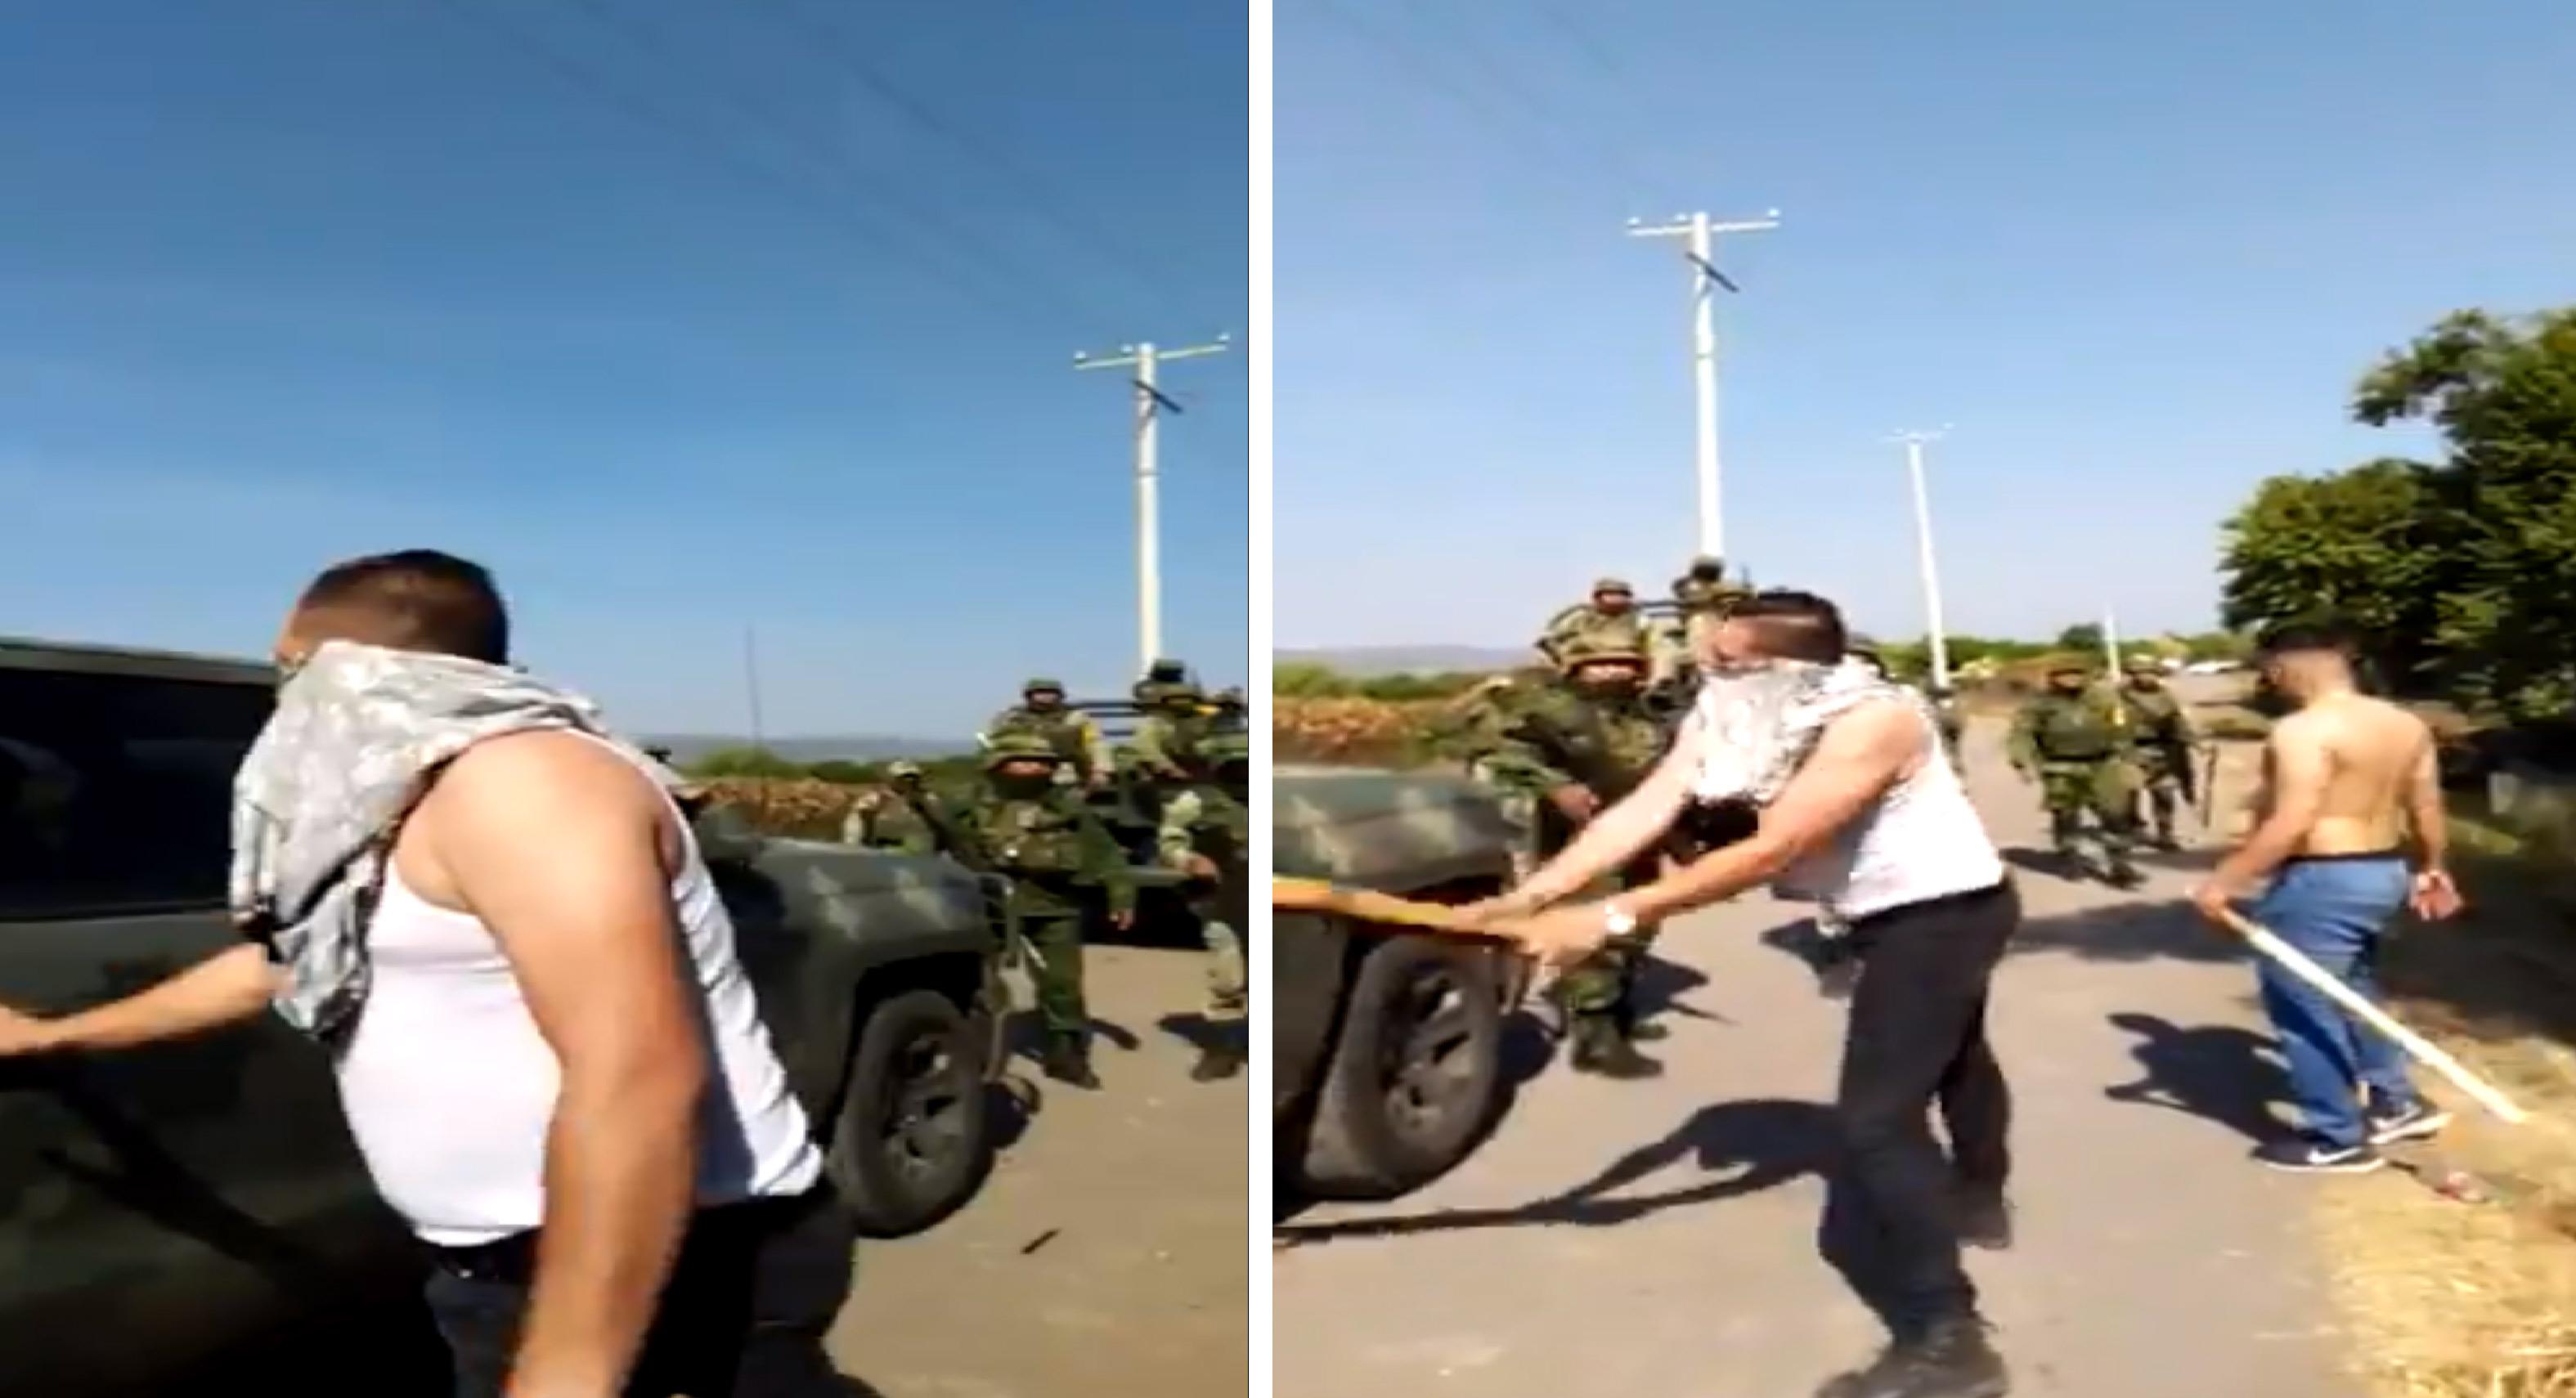 Encapuchados agreden con palos a militares || VIDEO